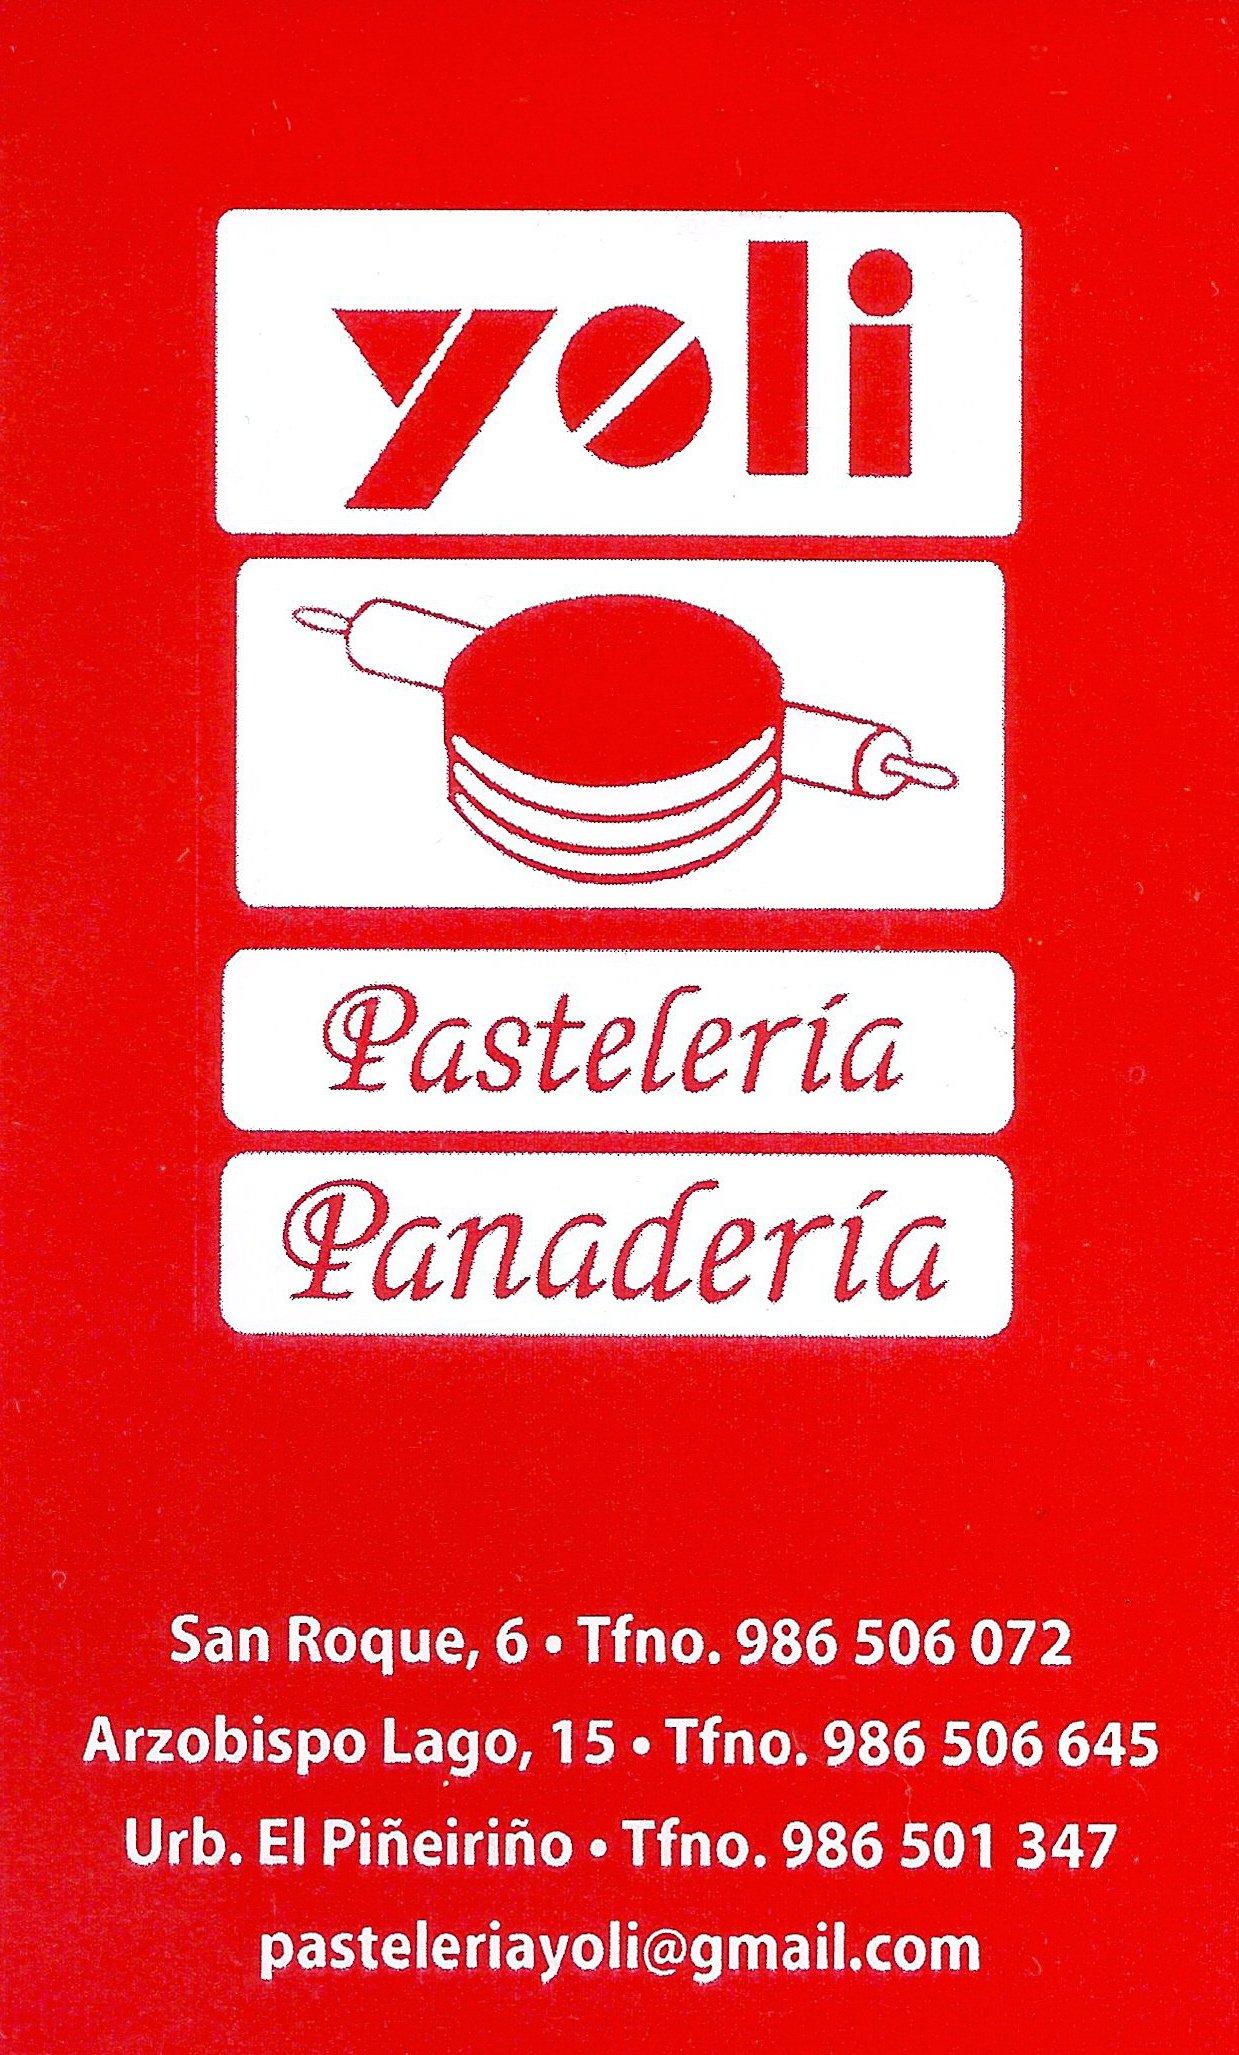 Yoli Pasteleria